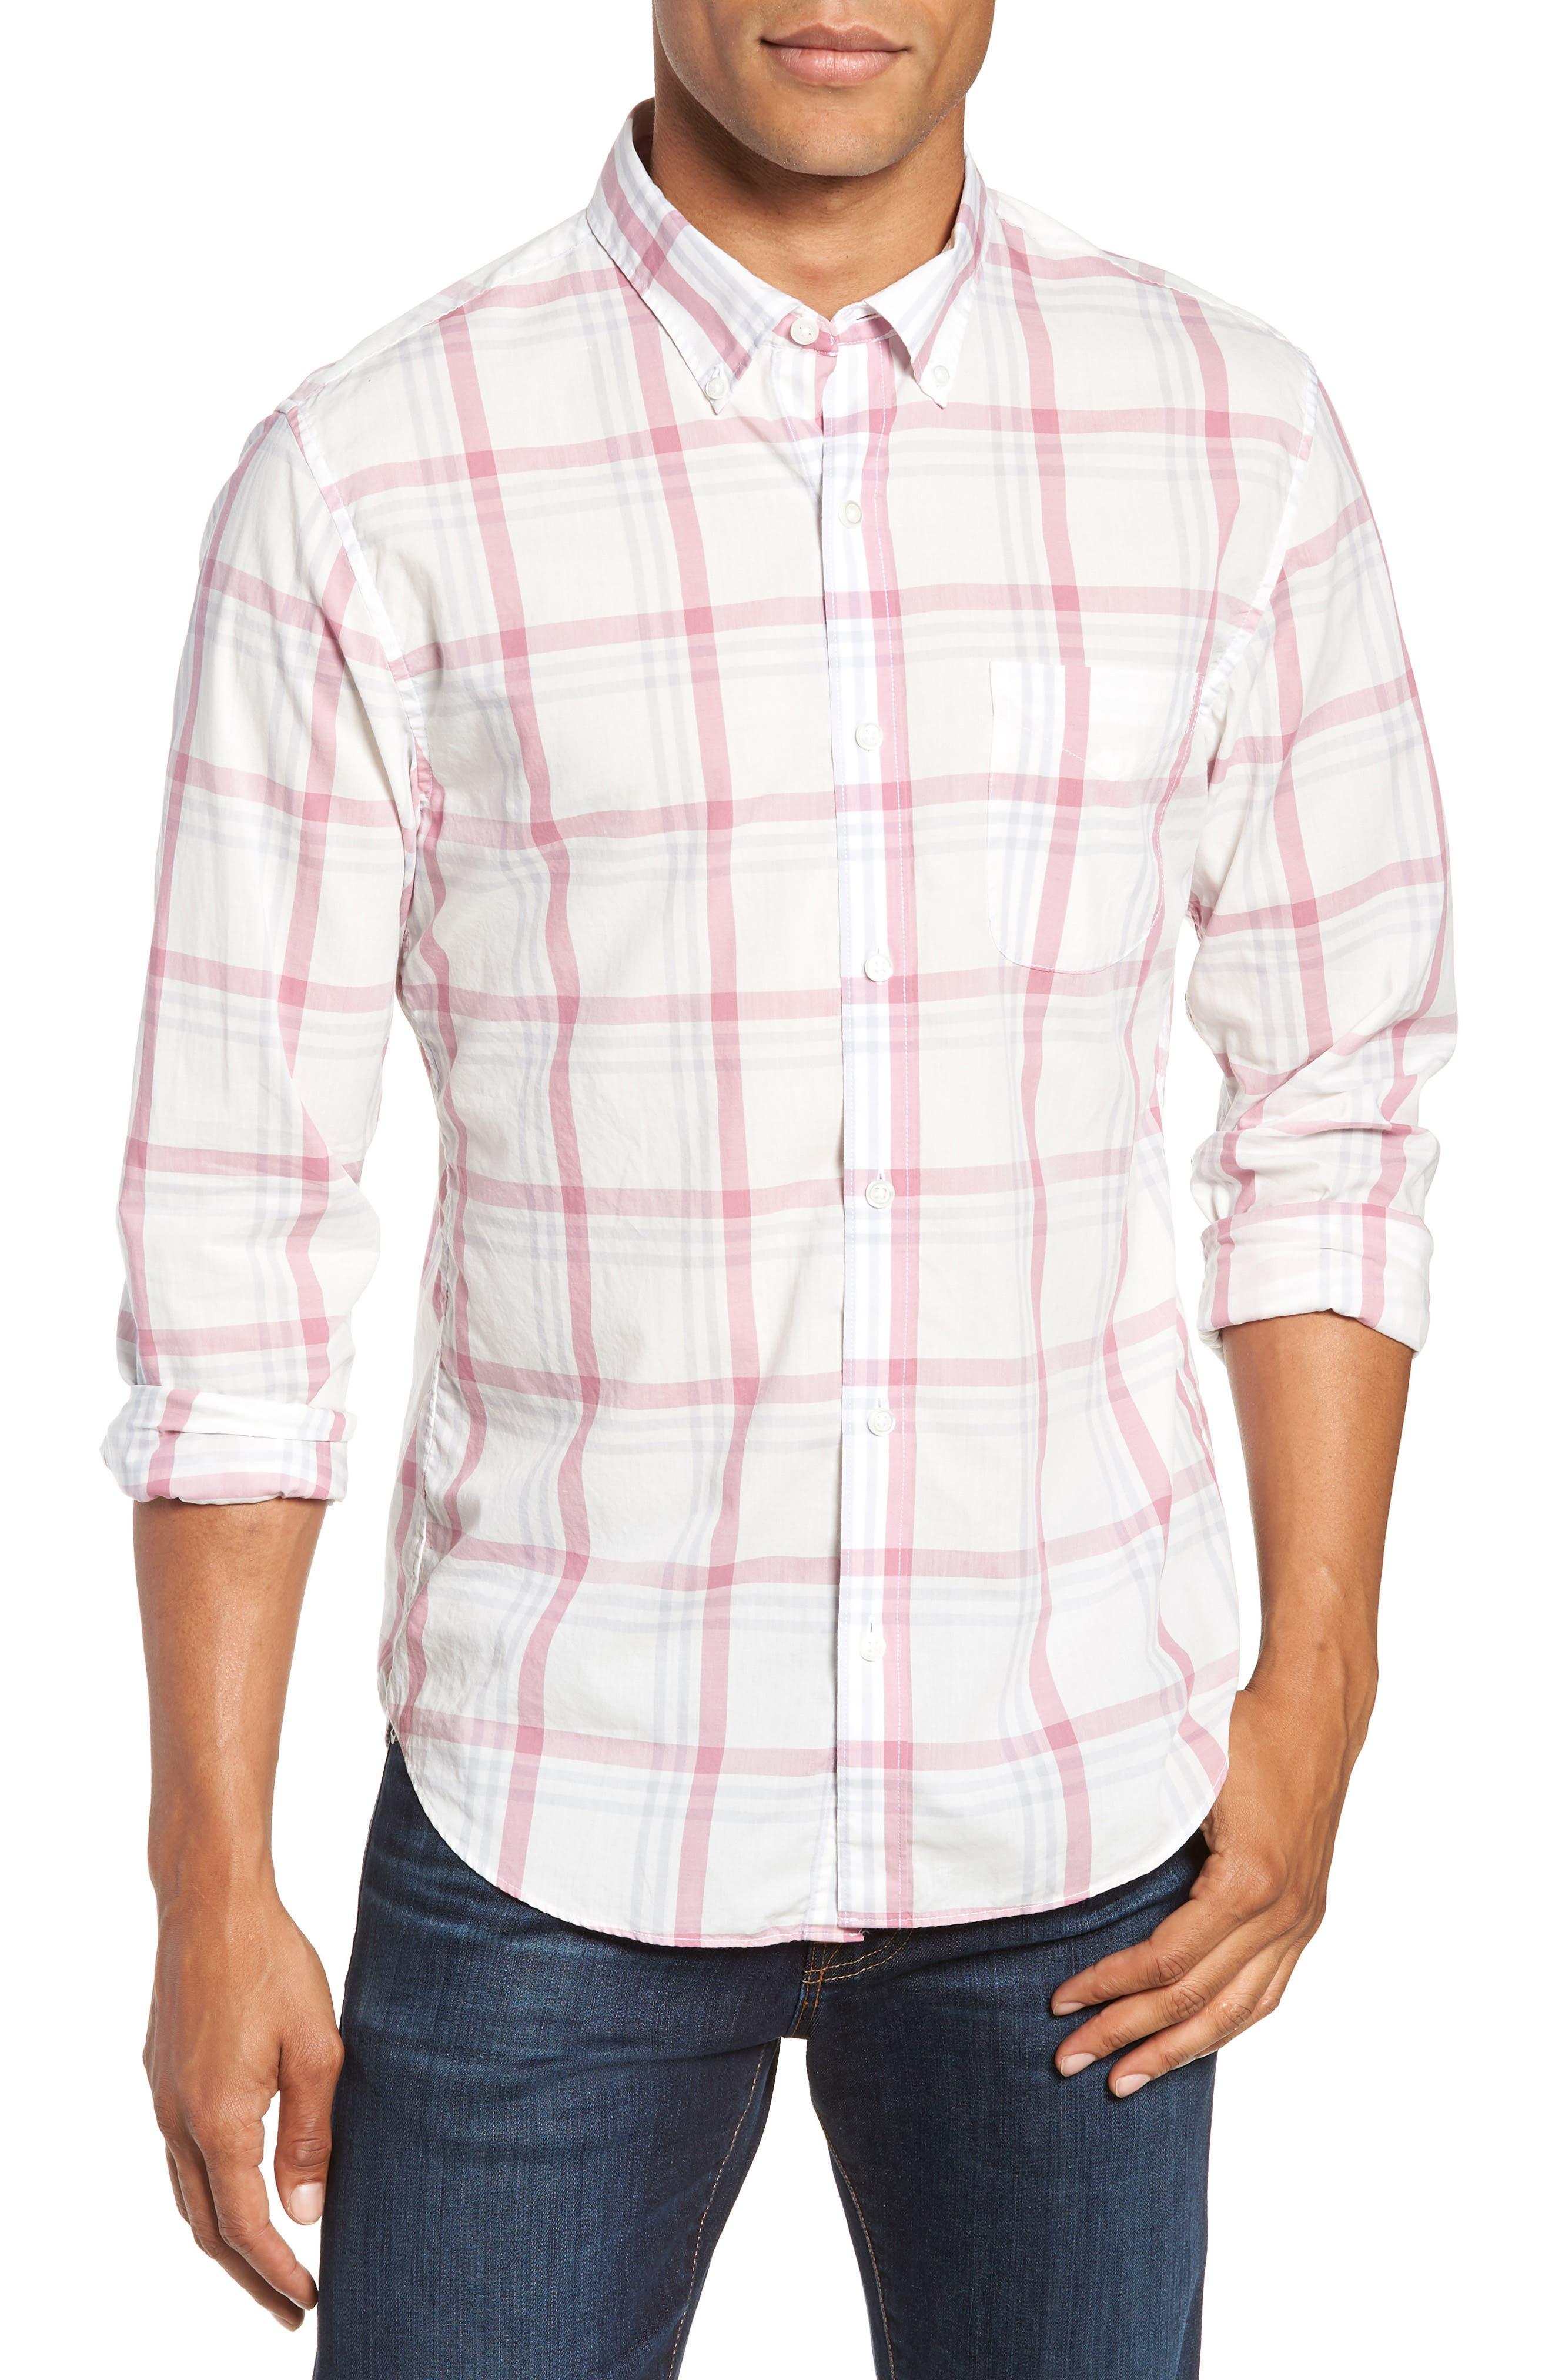 BONOBOS,                             Summerweight Slim Fit Plaid Sport Shirt,                             Main thumbnail 1, color,                             100